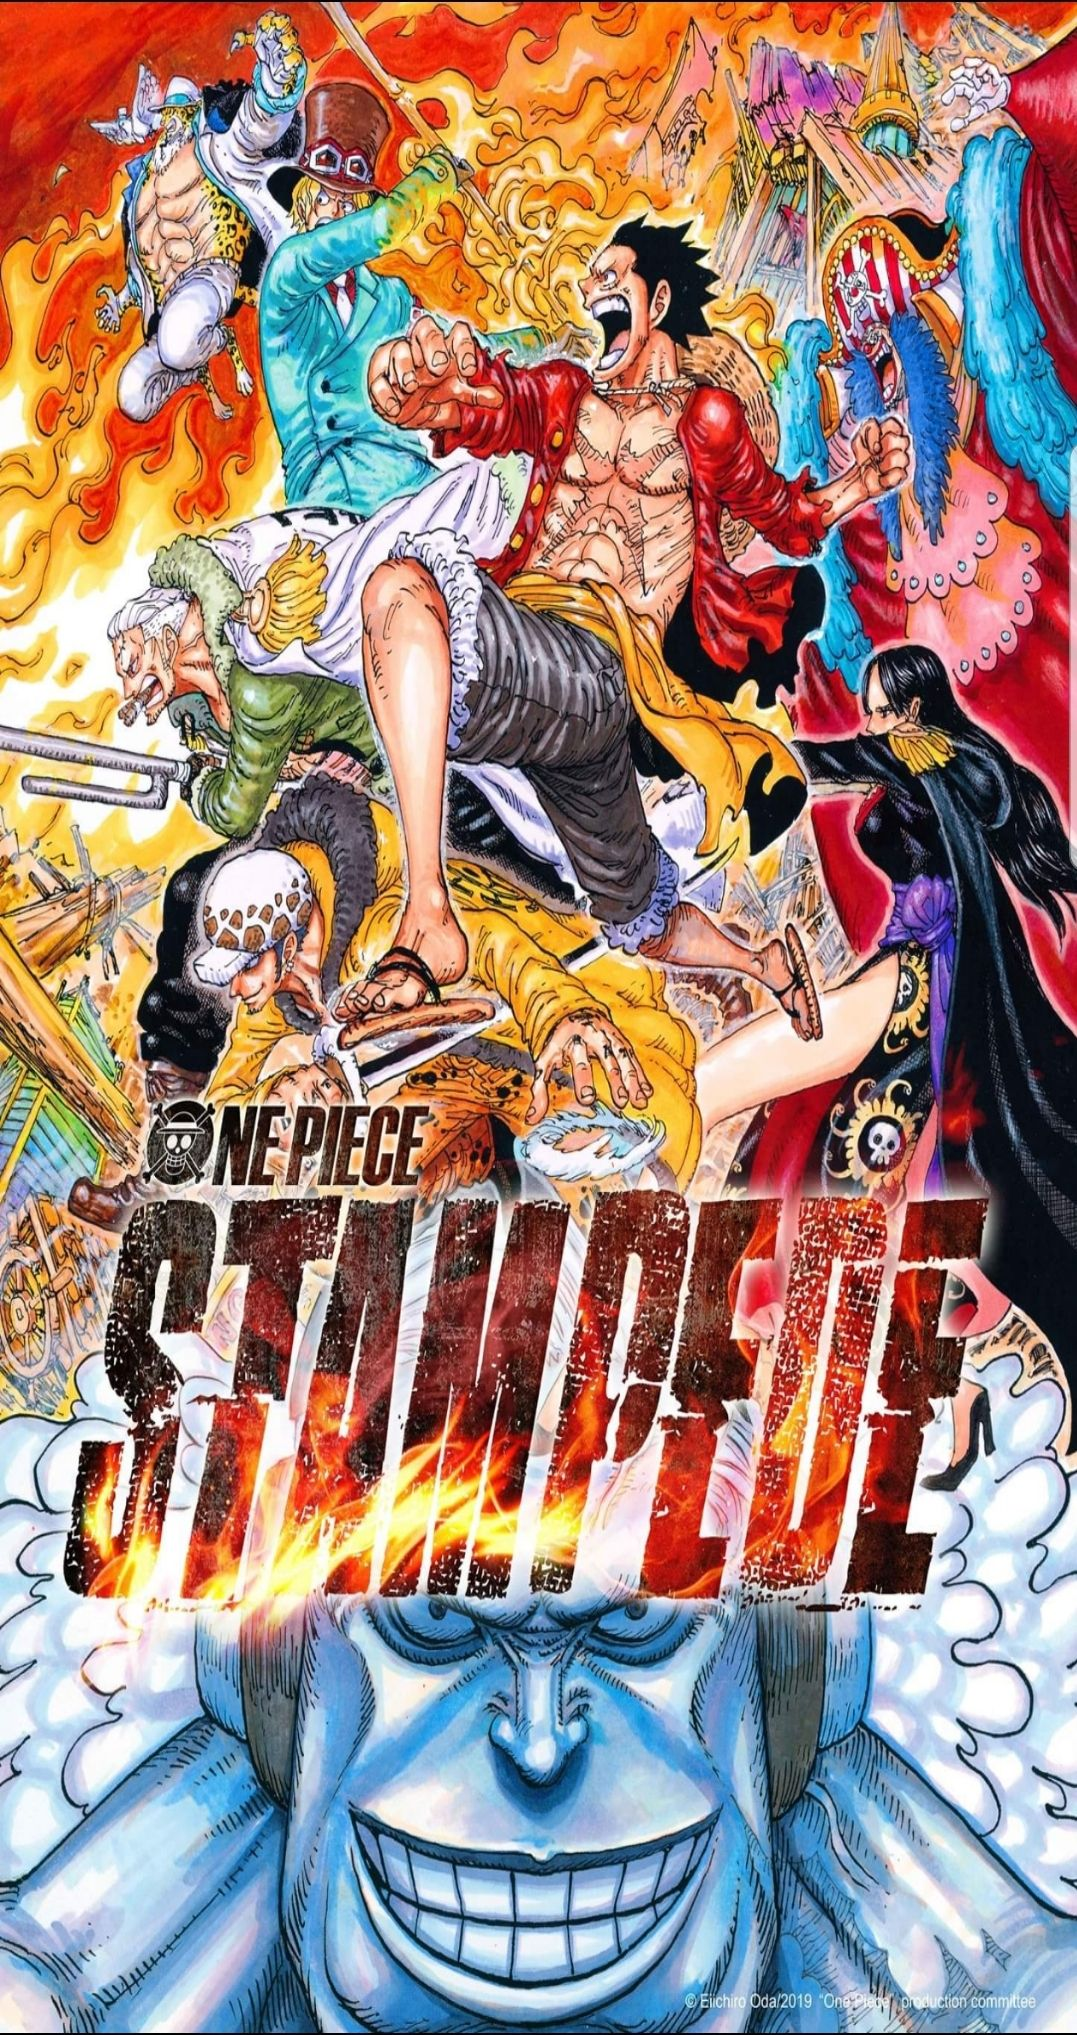 One Piece Wallpaper 4k Iphone - Ultra Wallpapers